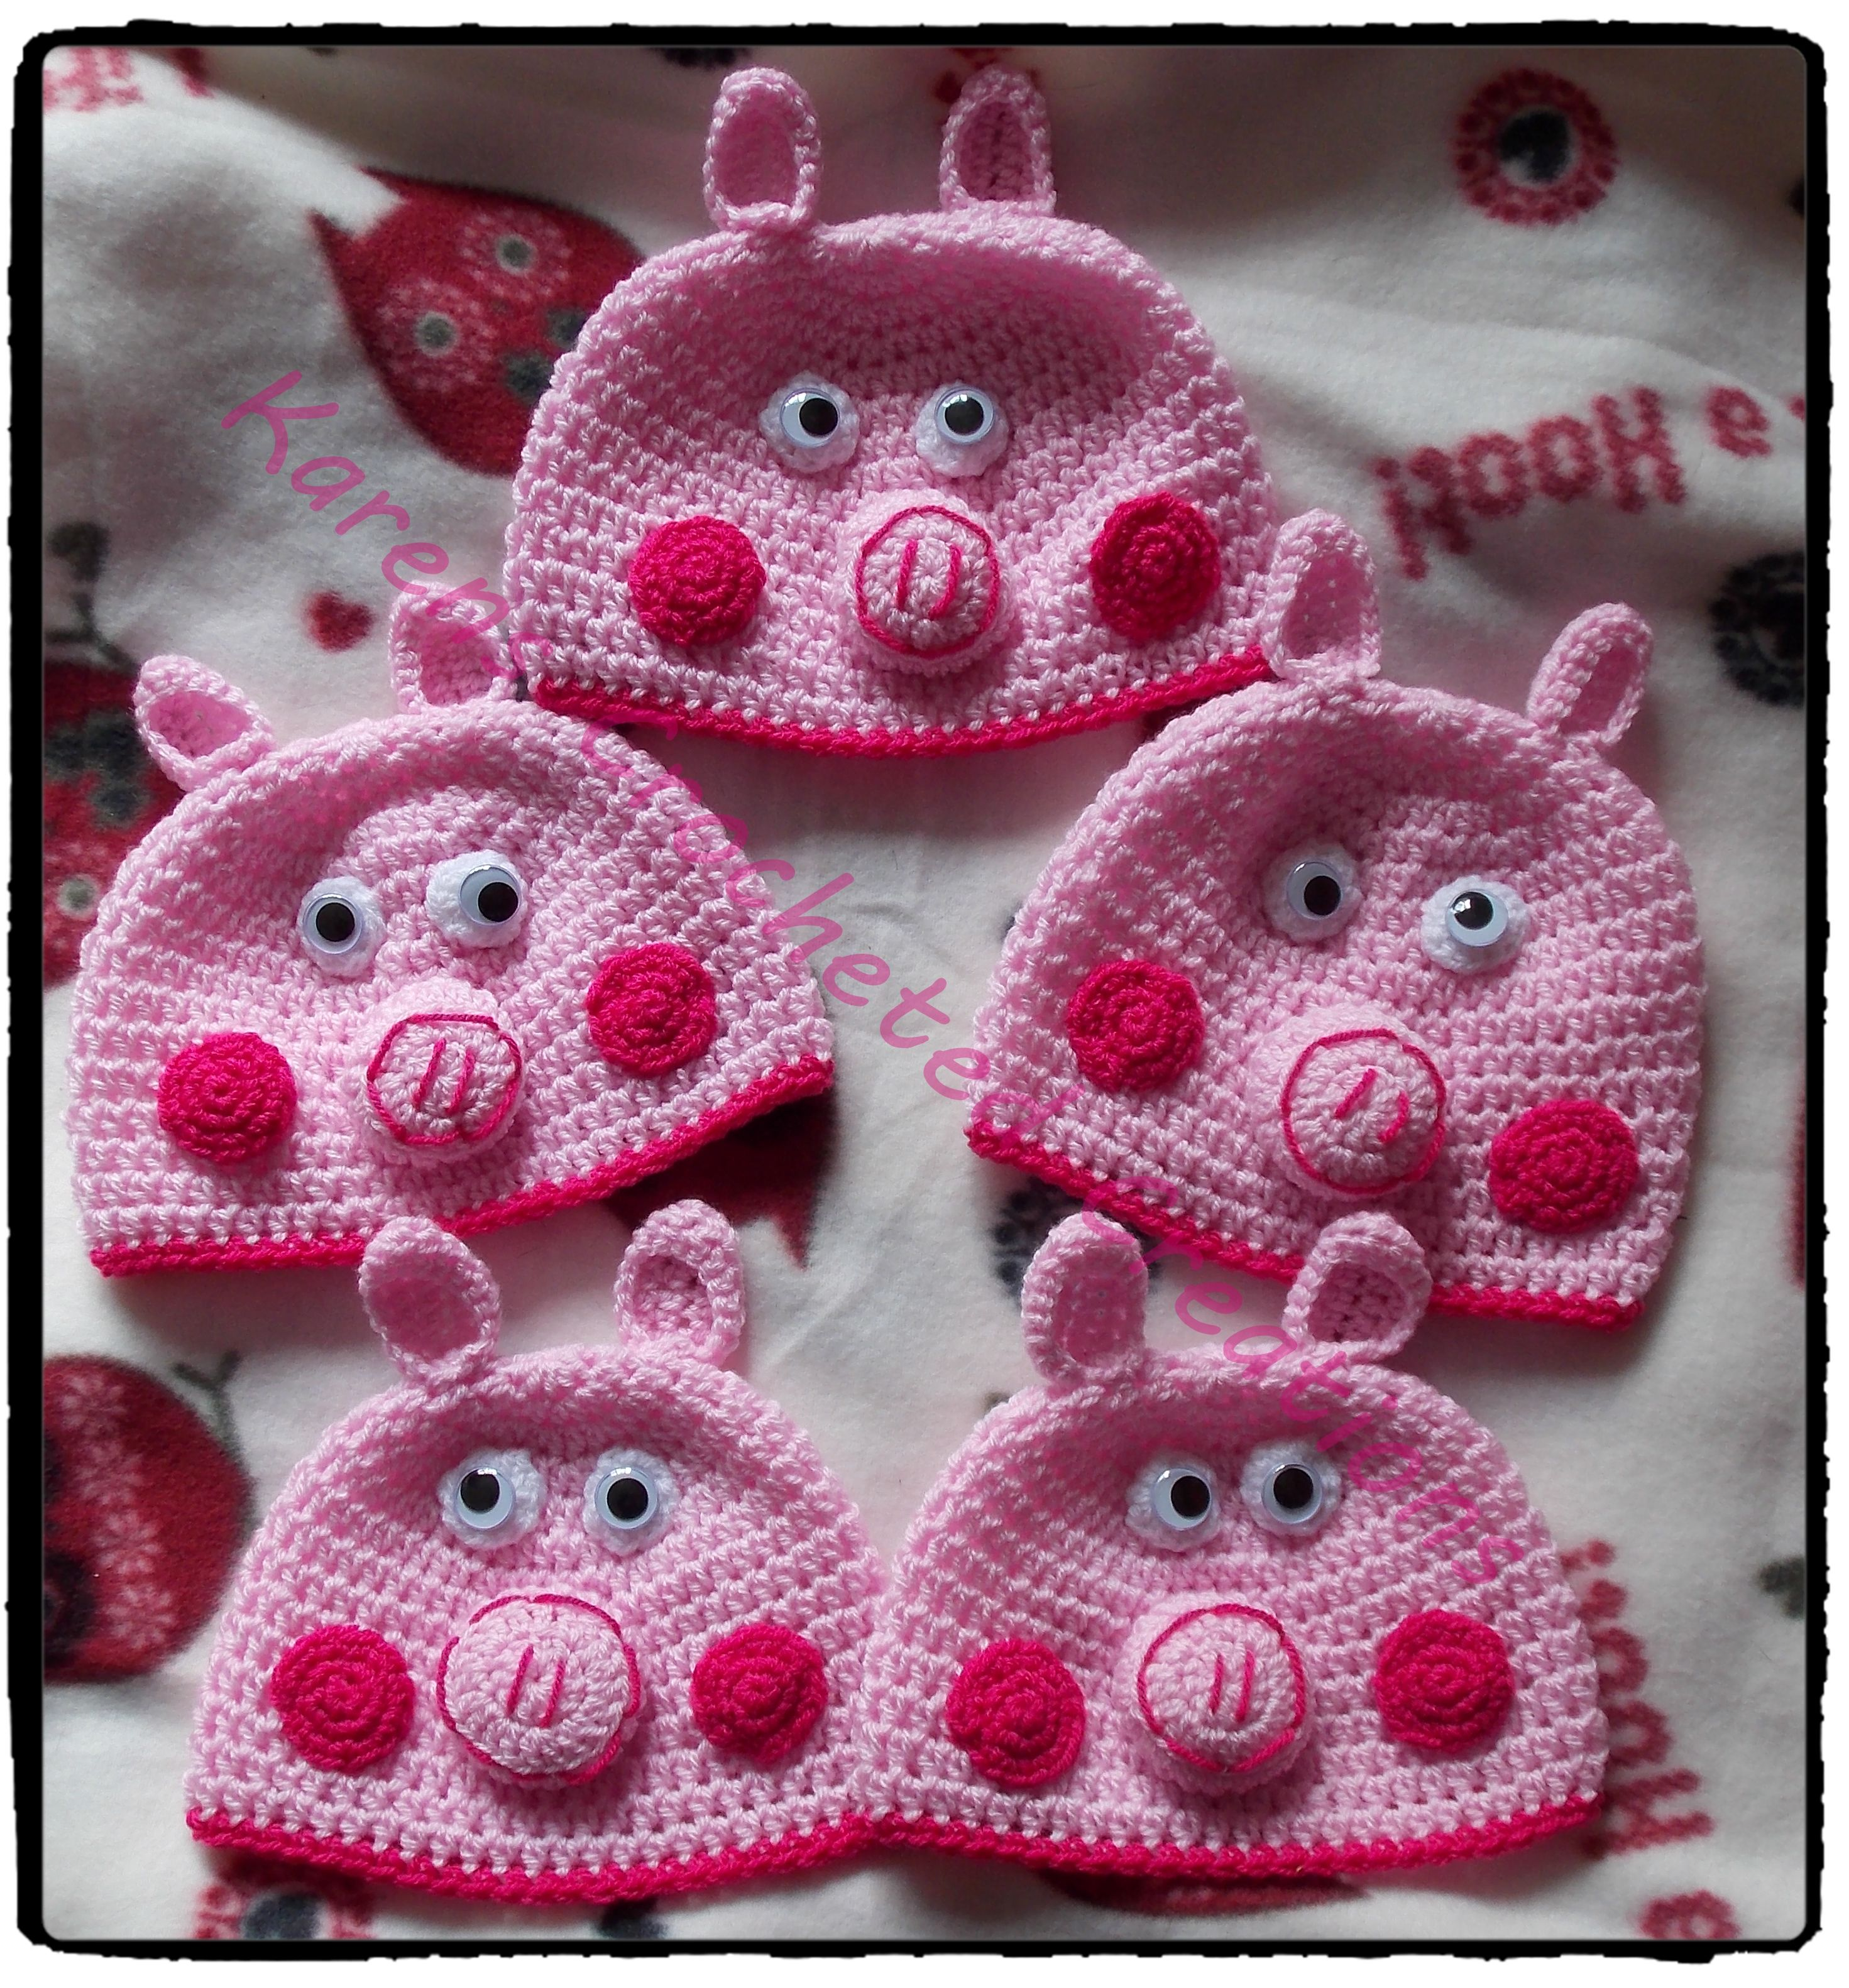 My free styled version of Peppa Pig hats | crochet peppa | Pinterest ...